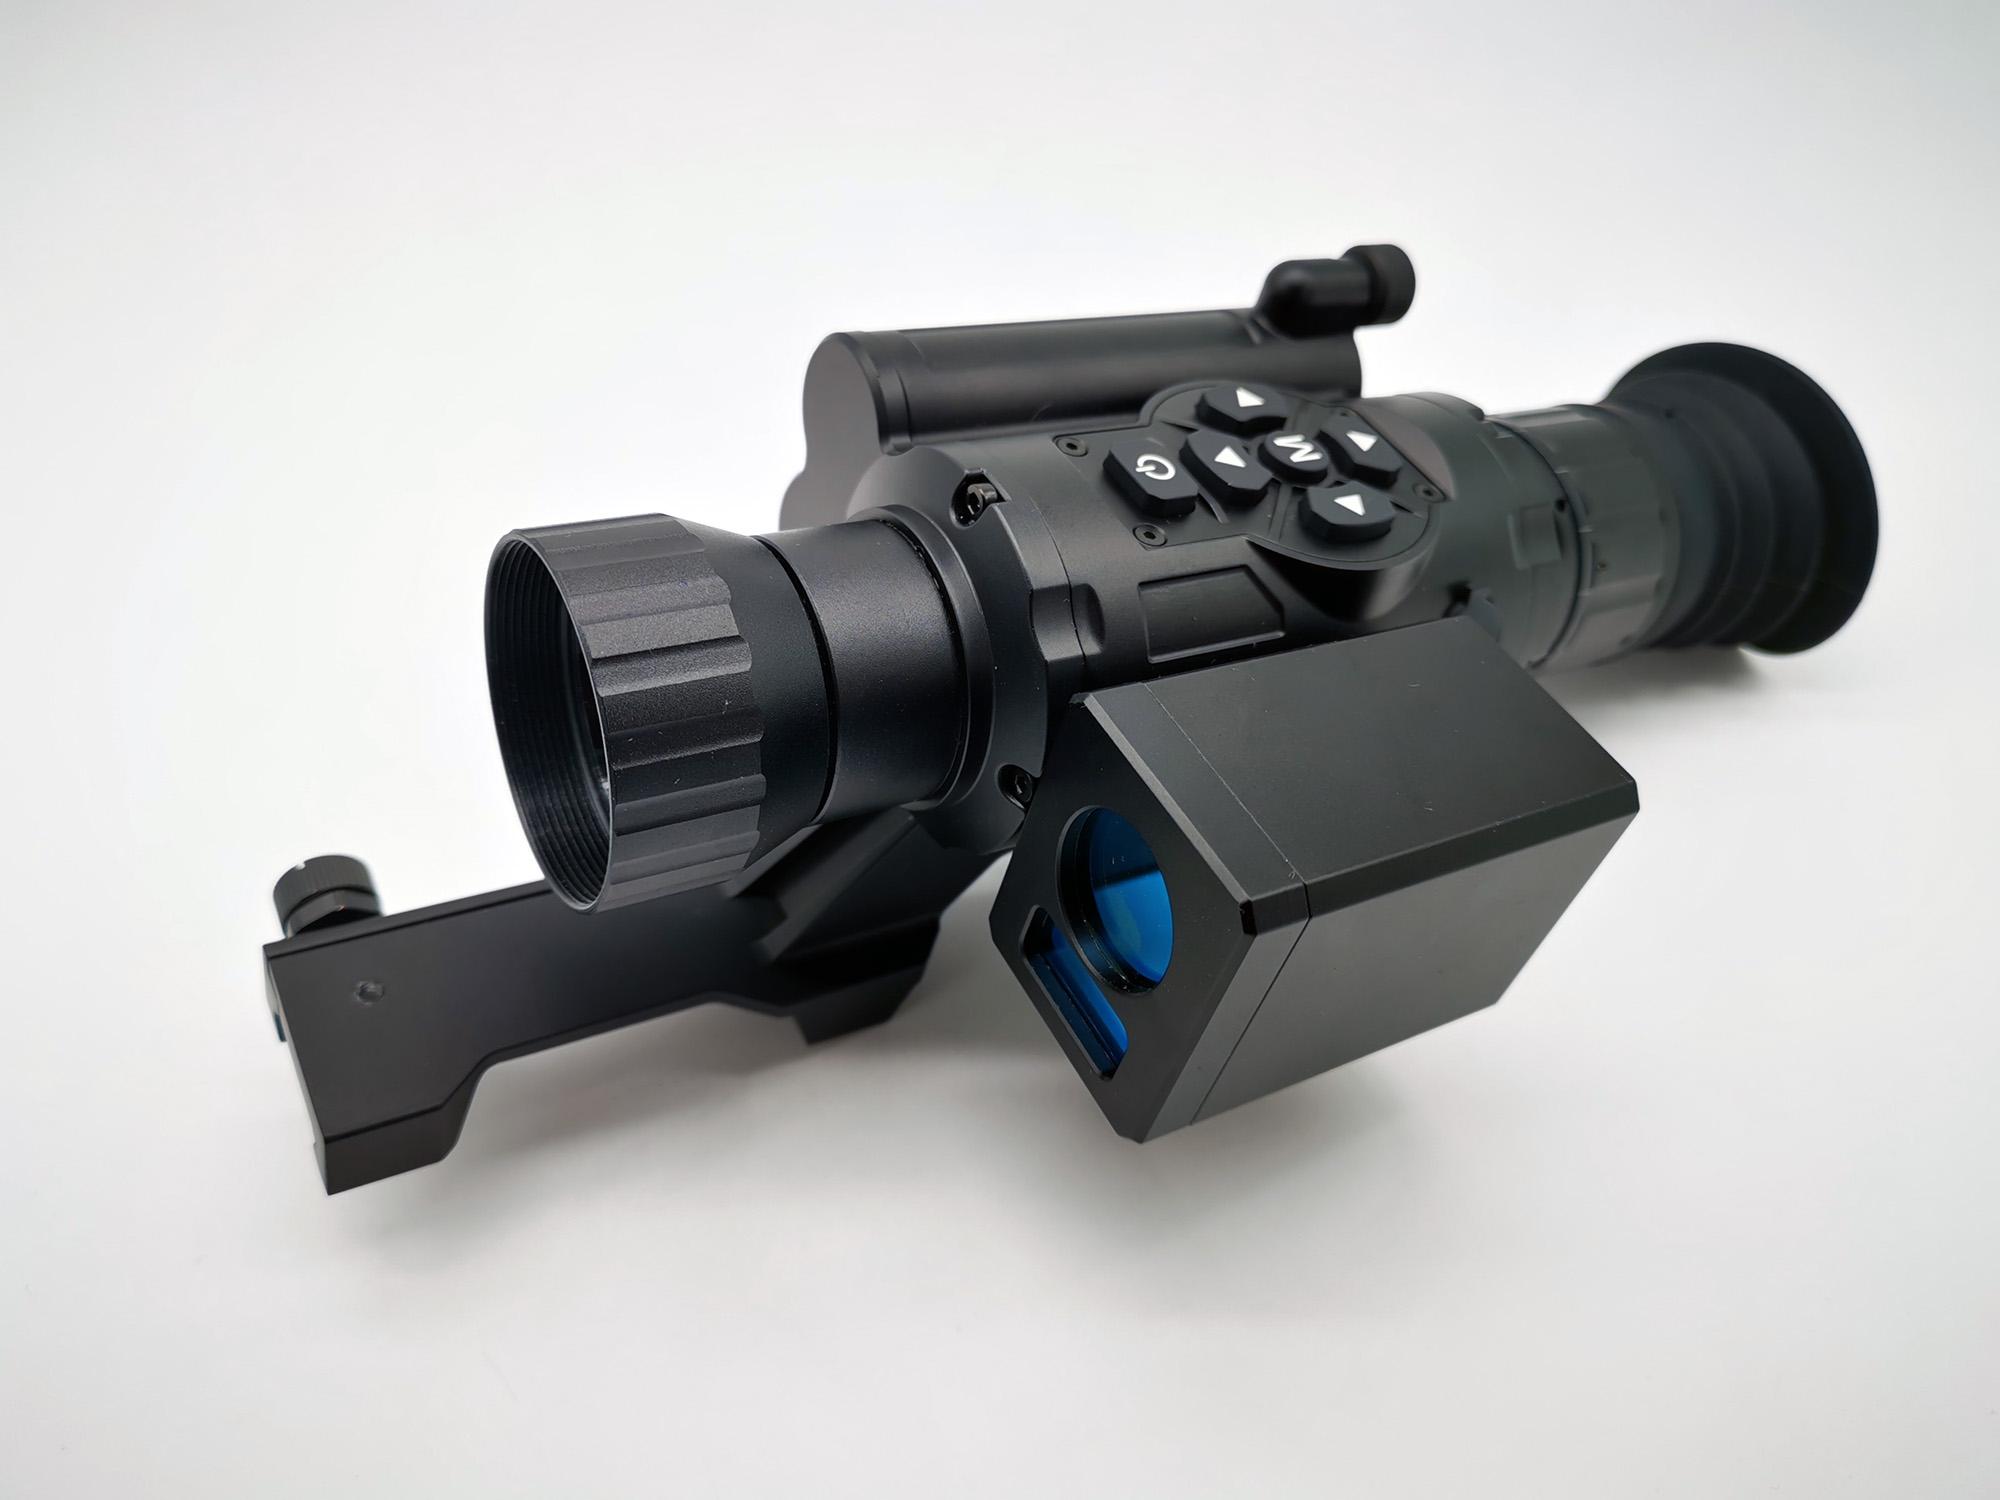 T4 L Thermal Gun Scope 1